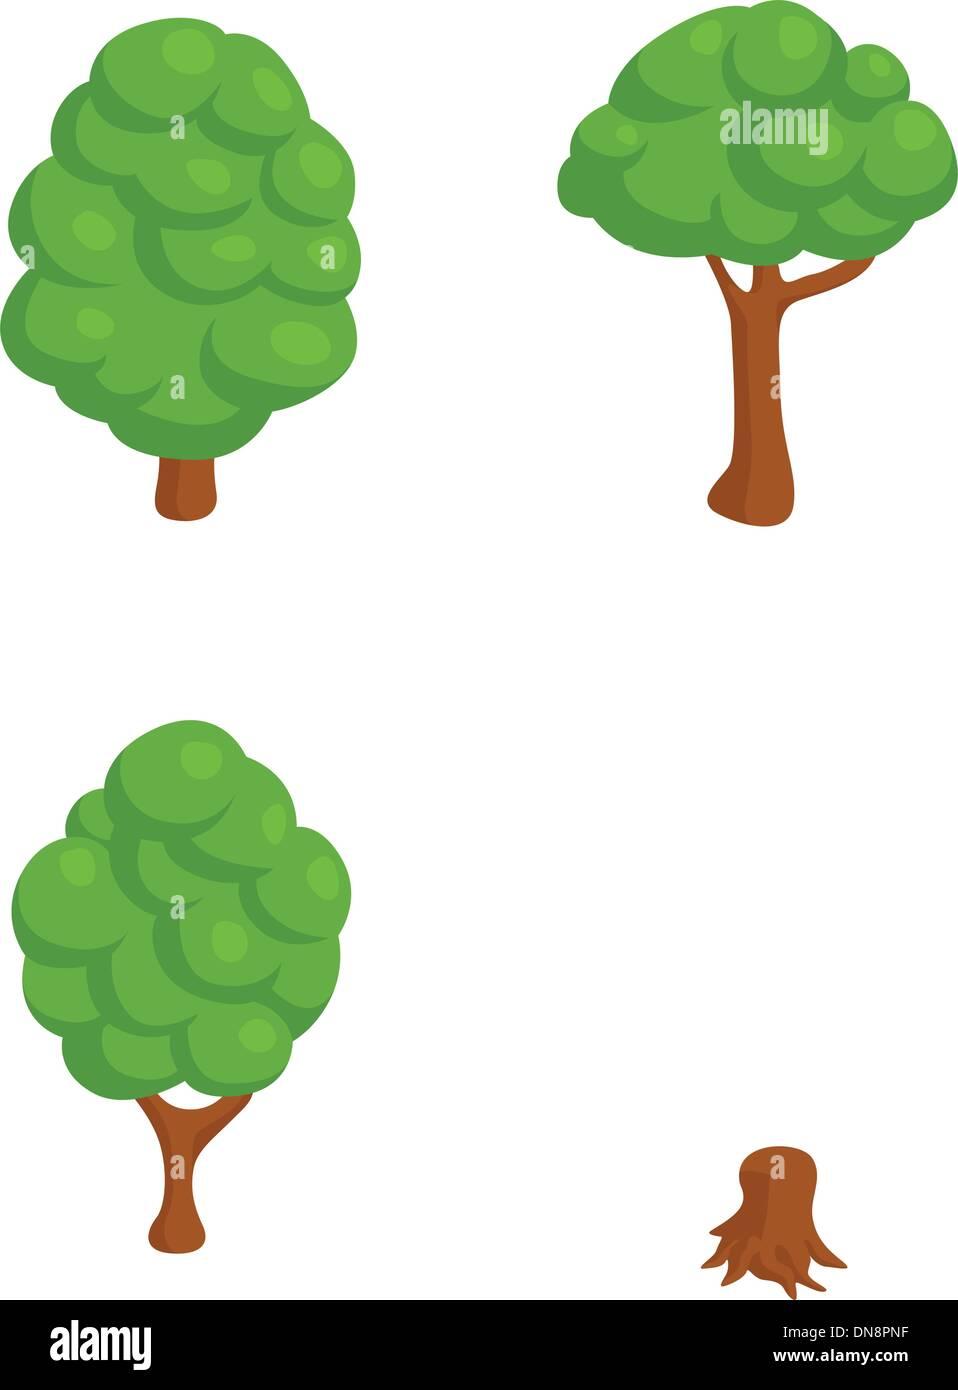 Set of 4 Isometric Trees - Stock Image